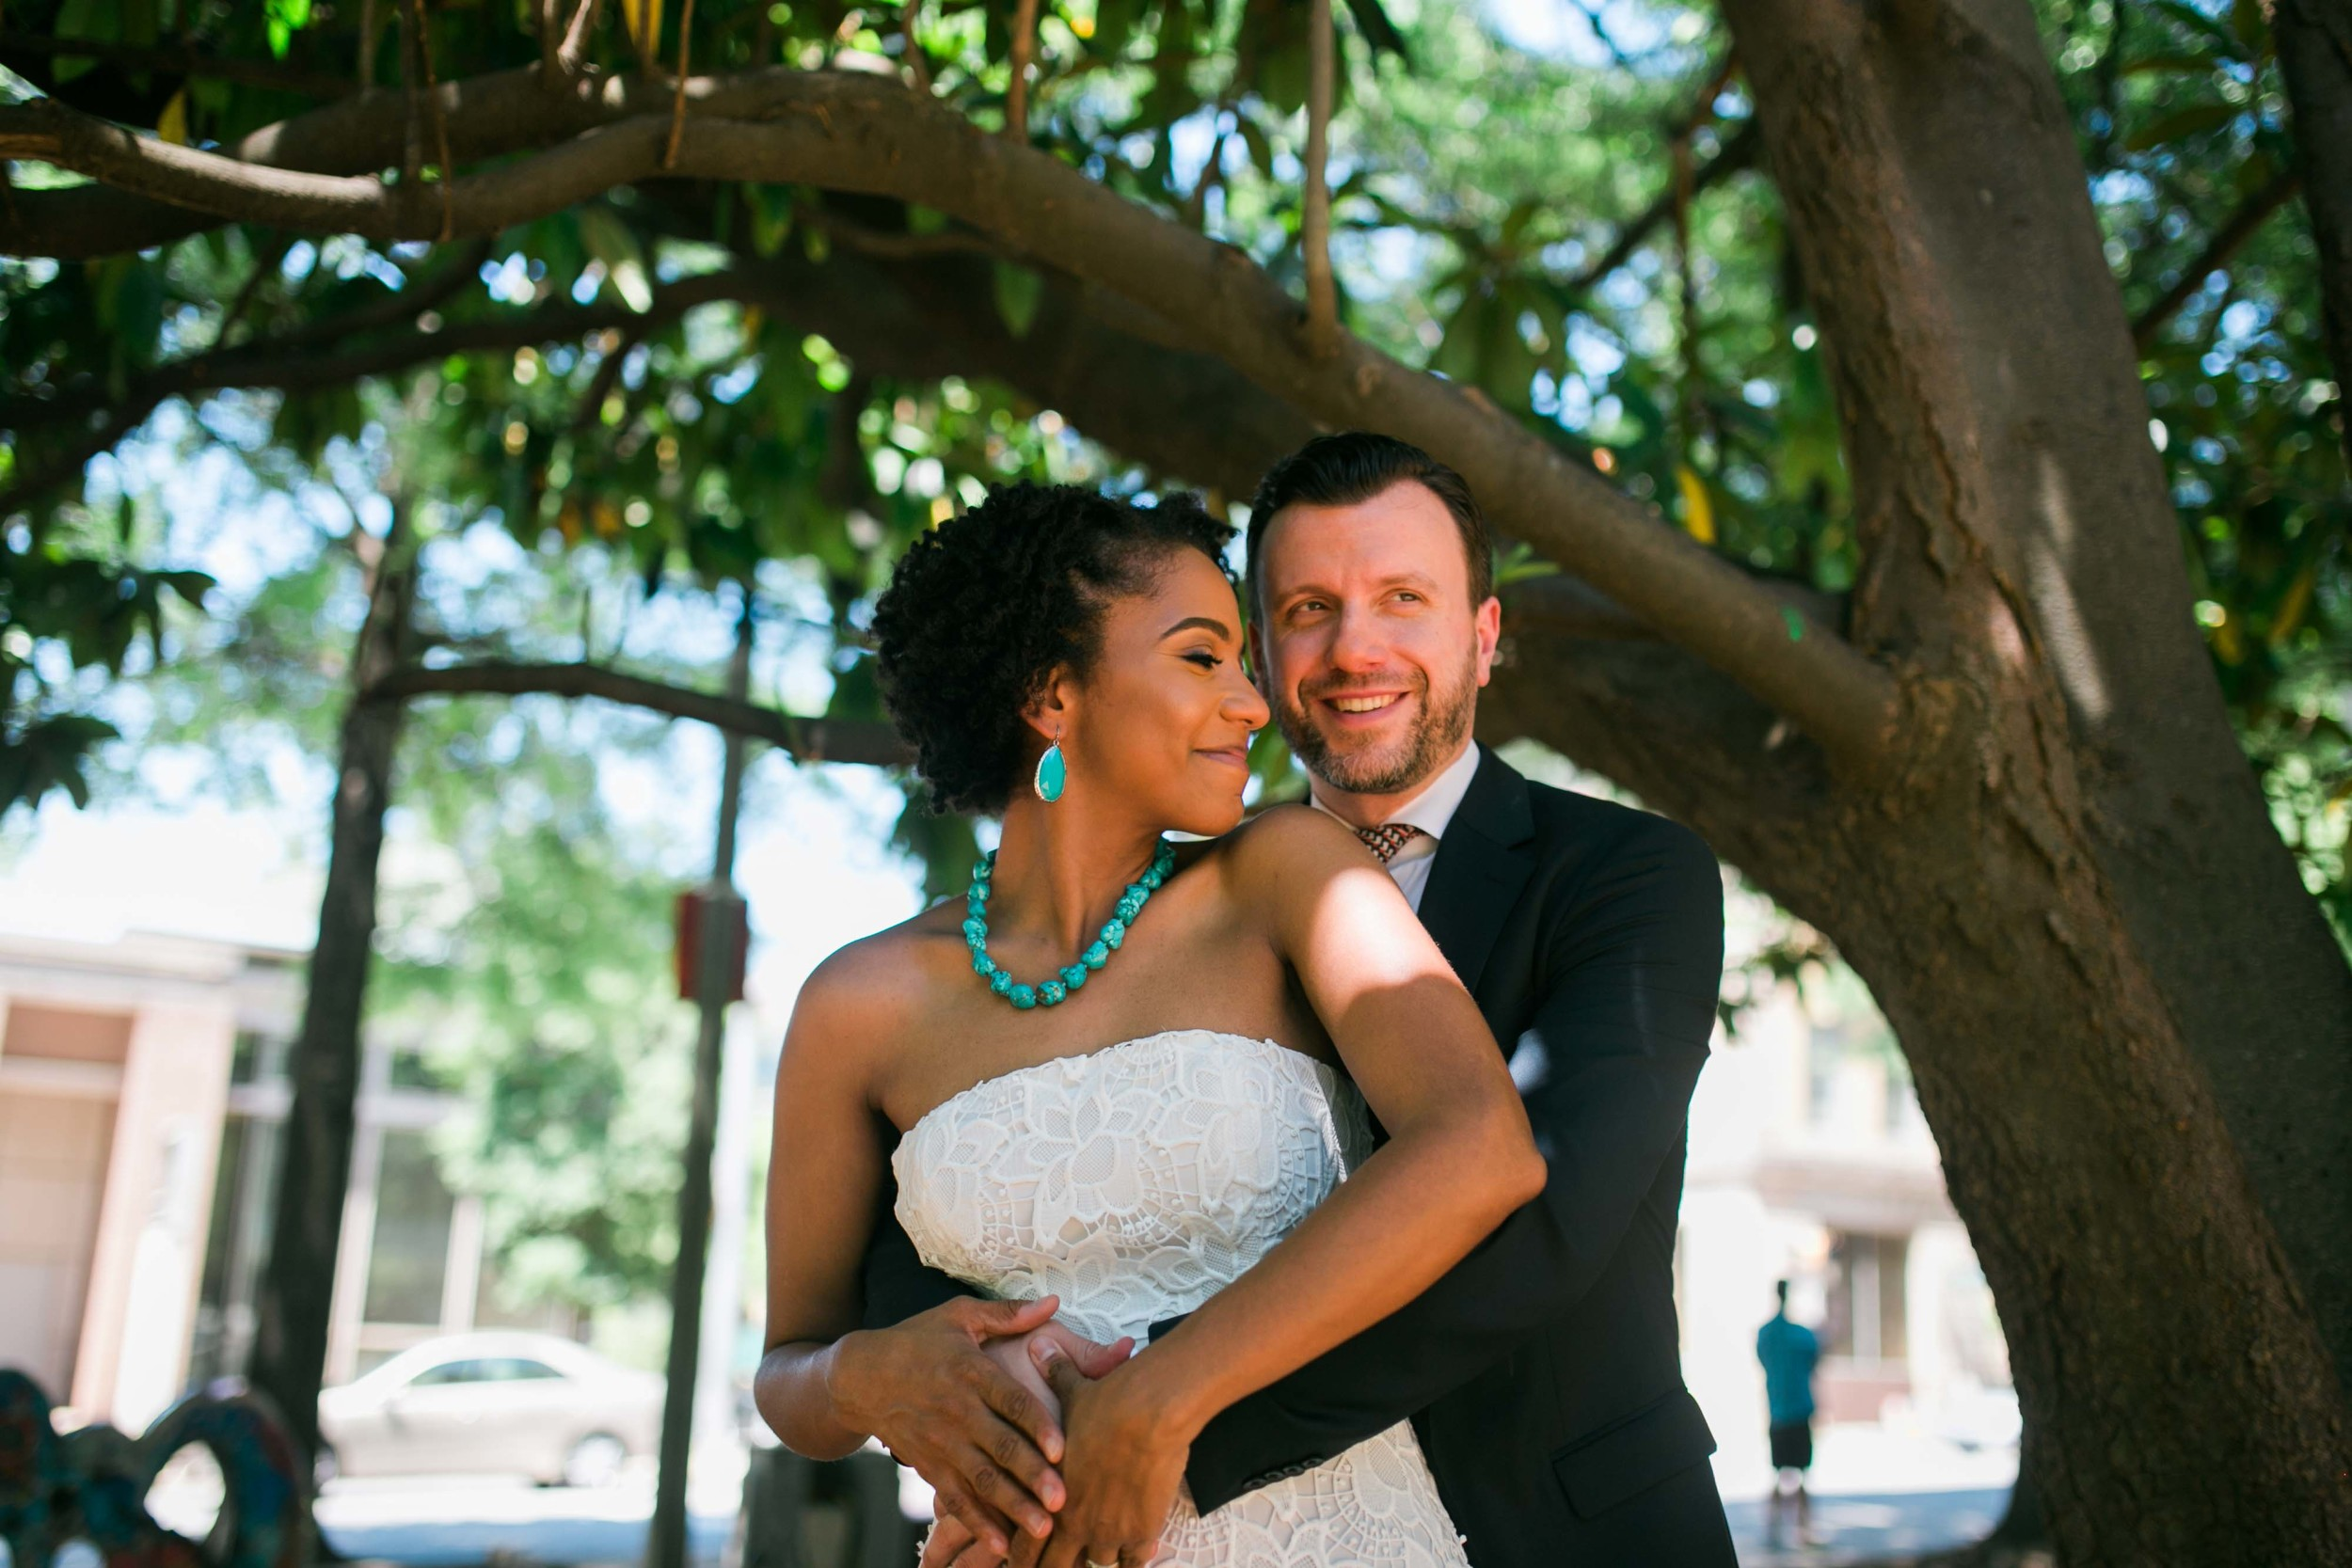 Dekalb-County-Courthouse-Wedding-Photos-Kiyah-C-Photography-50.jpg